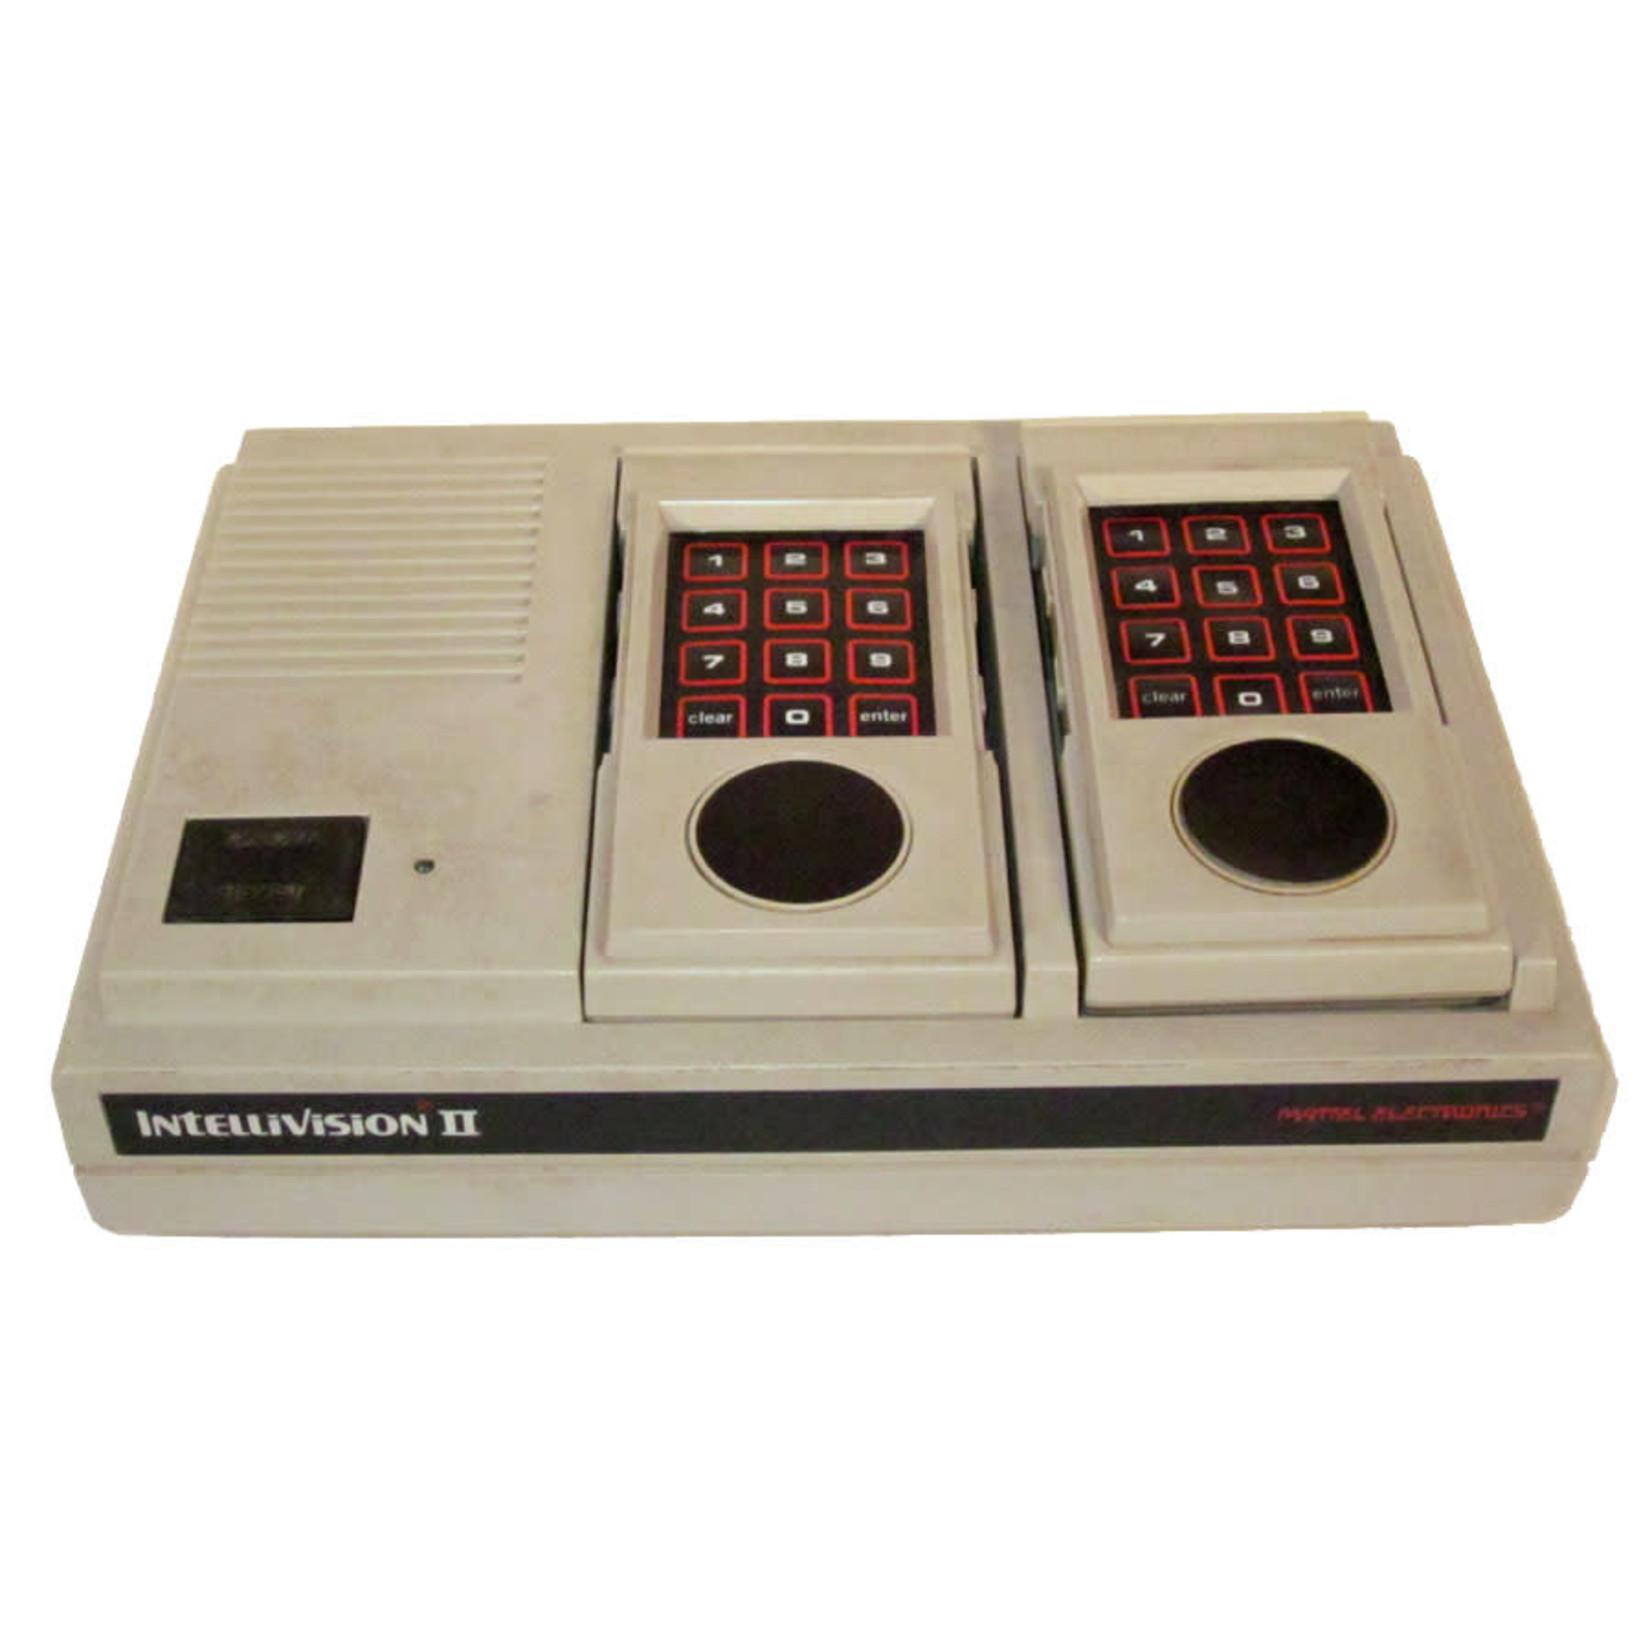 System-Intellivision II